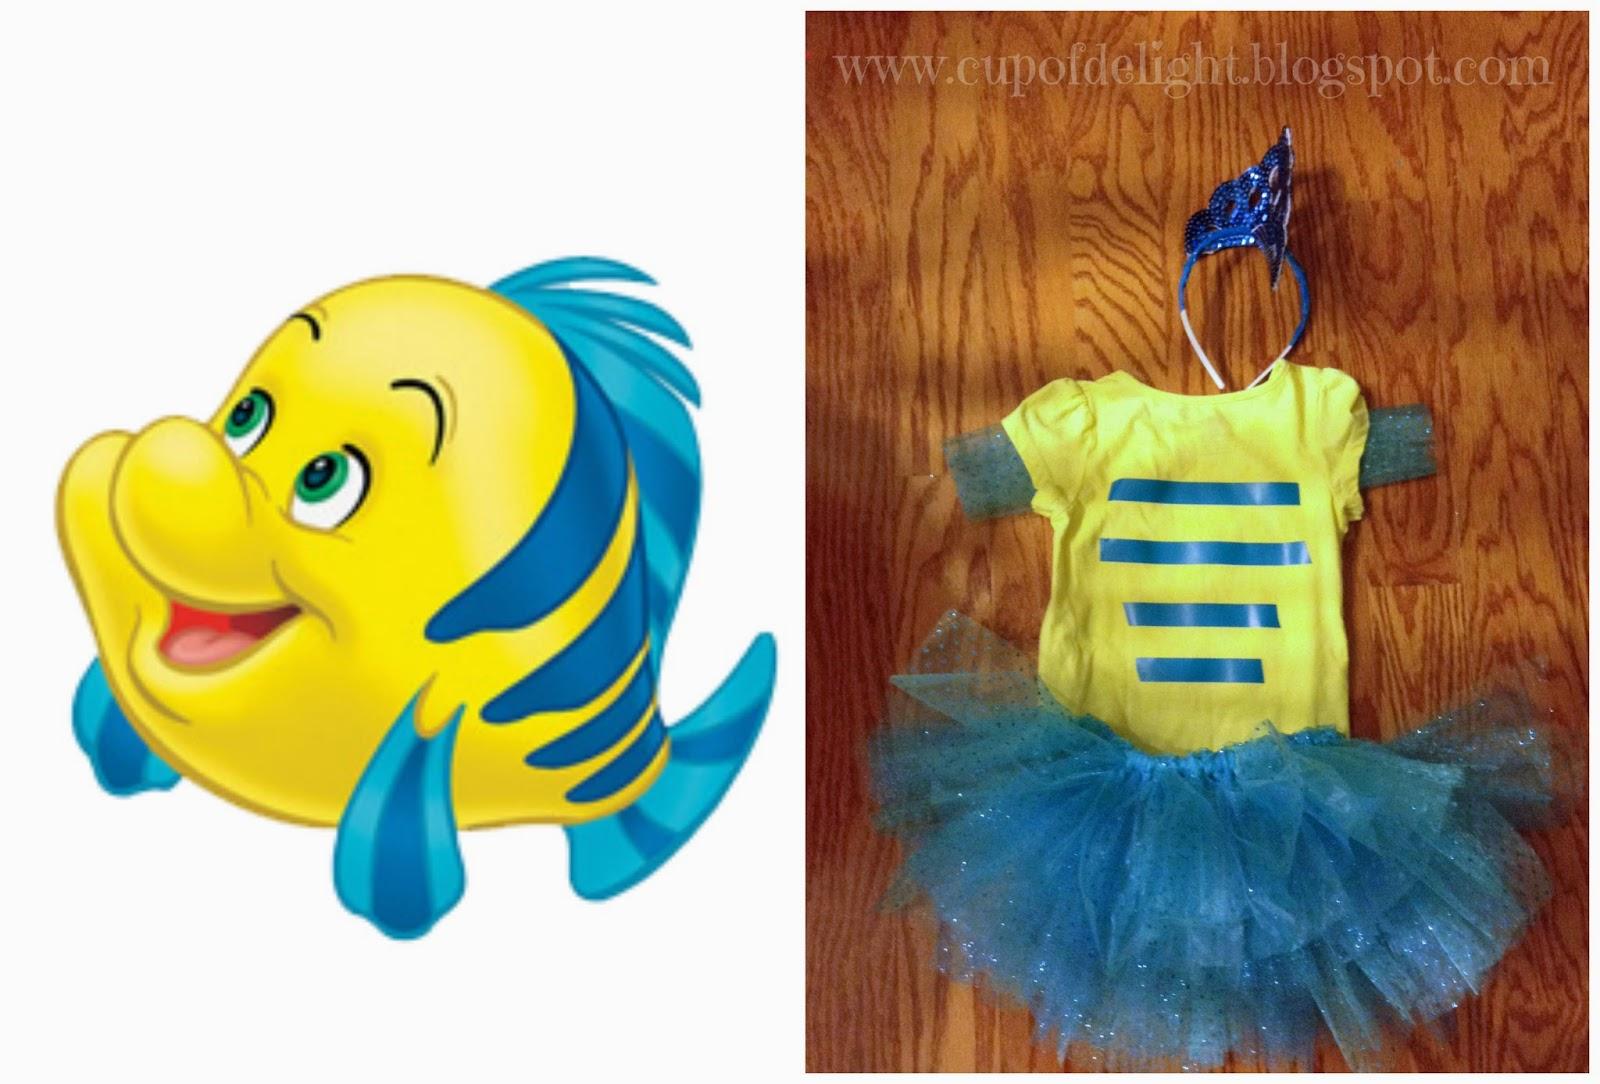 Flounder Costume Baby  sc 1 st  Lekton.info & Flounder Costume Baby - lekton.info